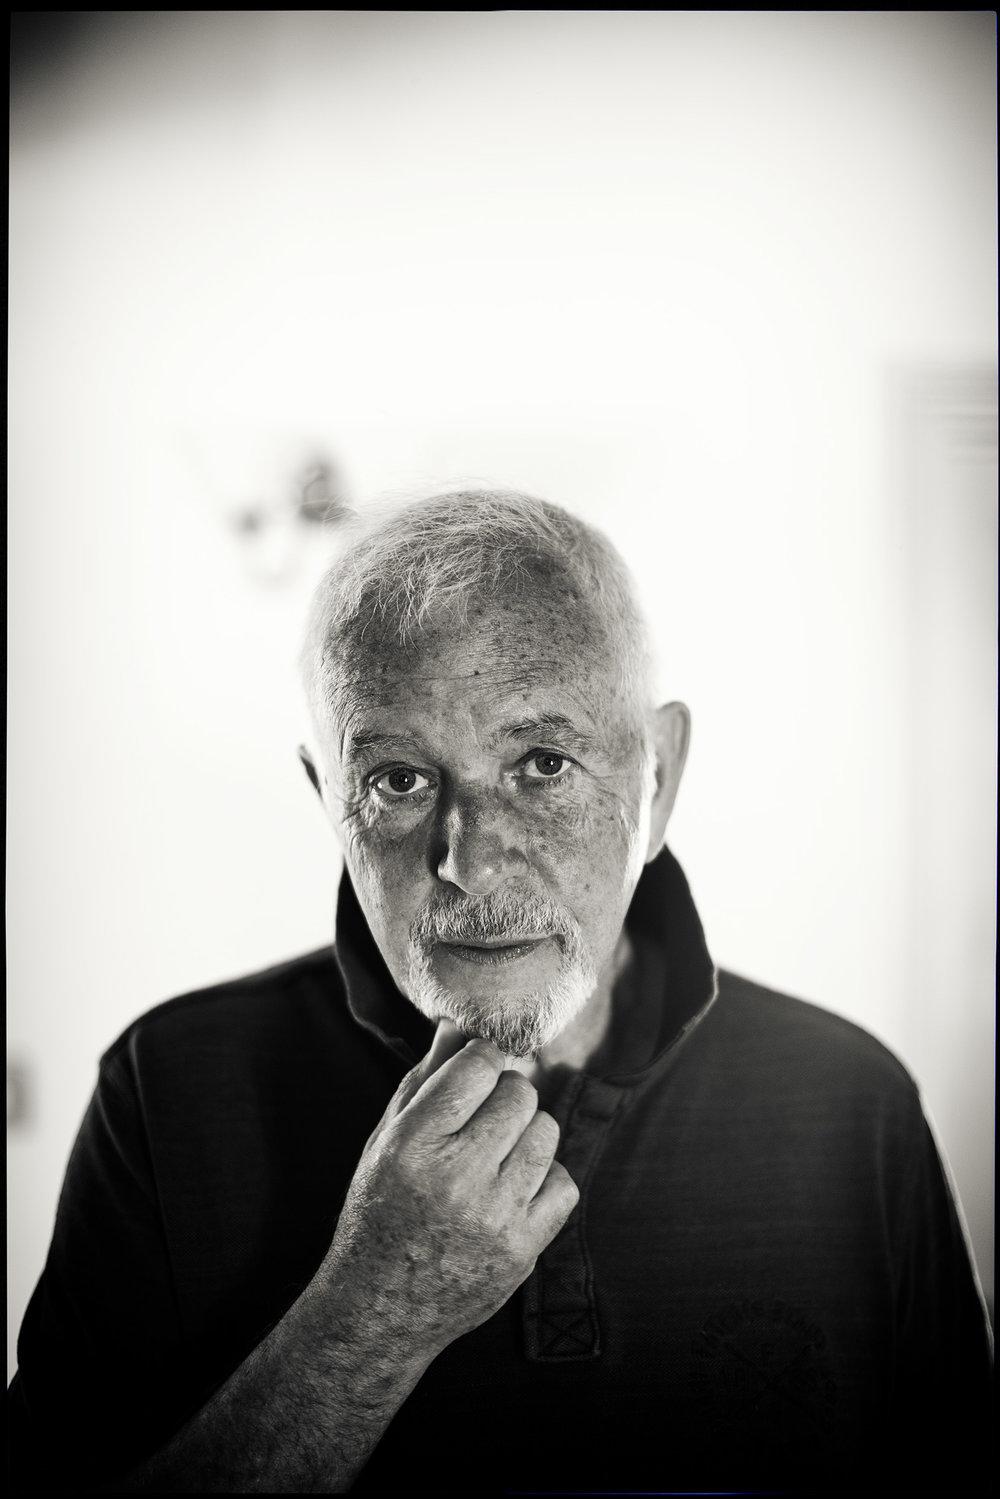 David Essex April 2017